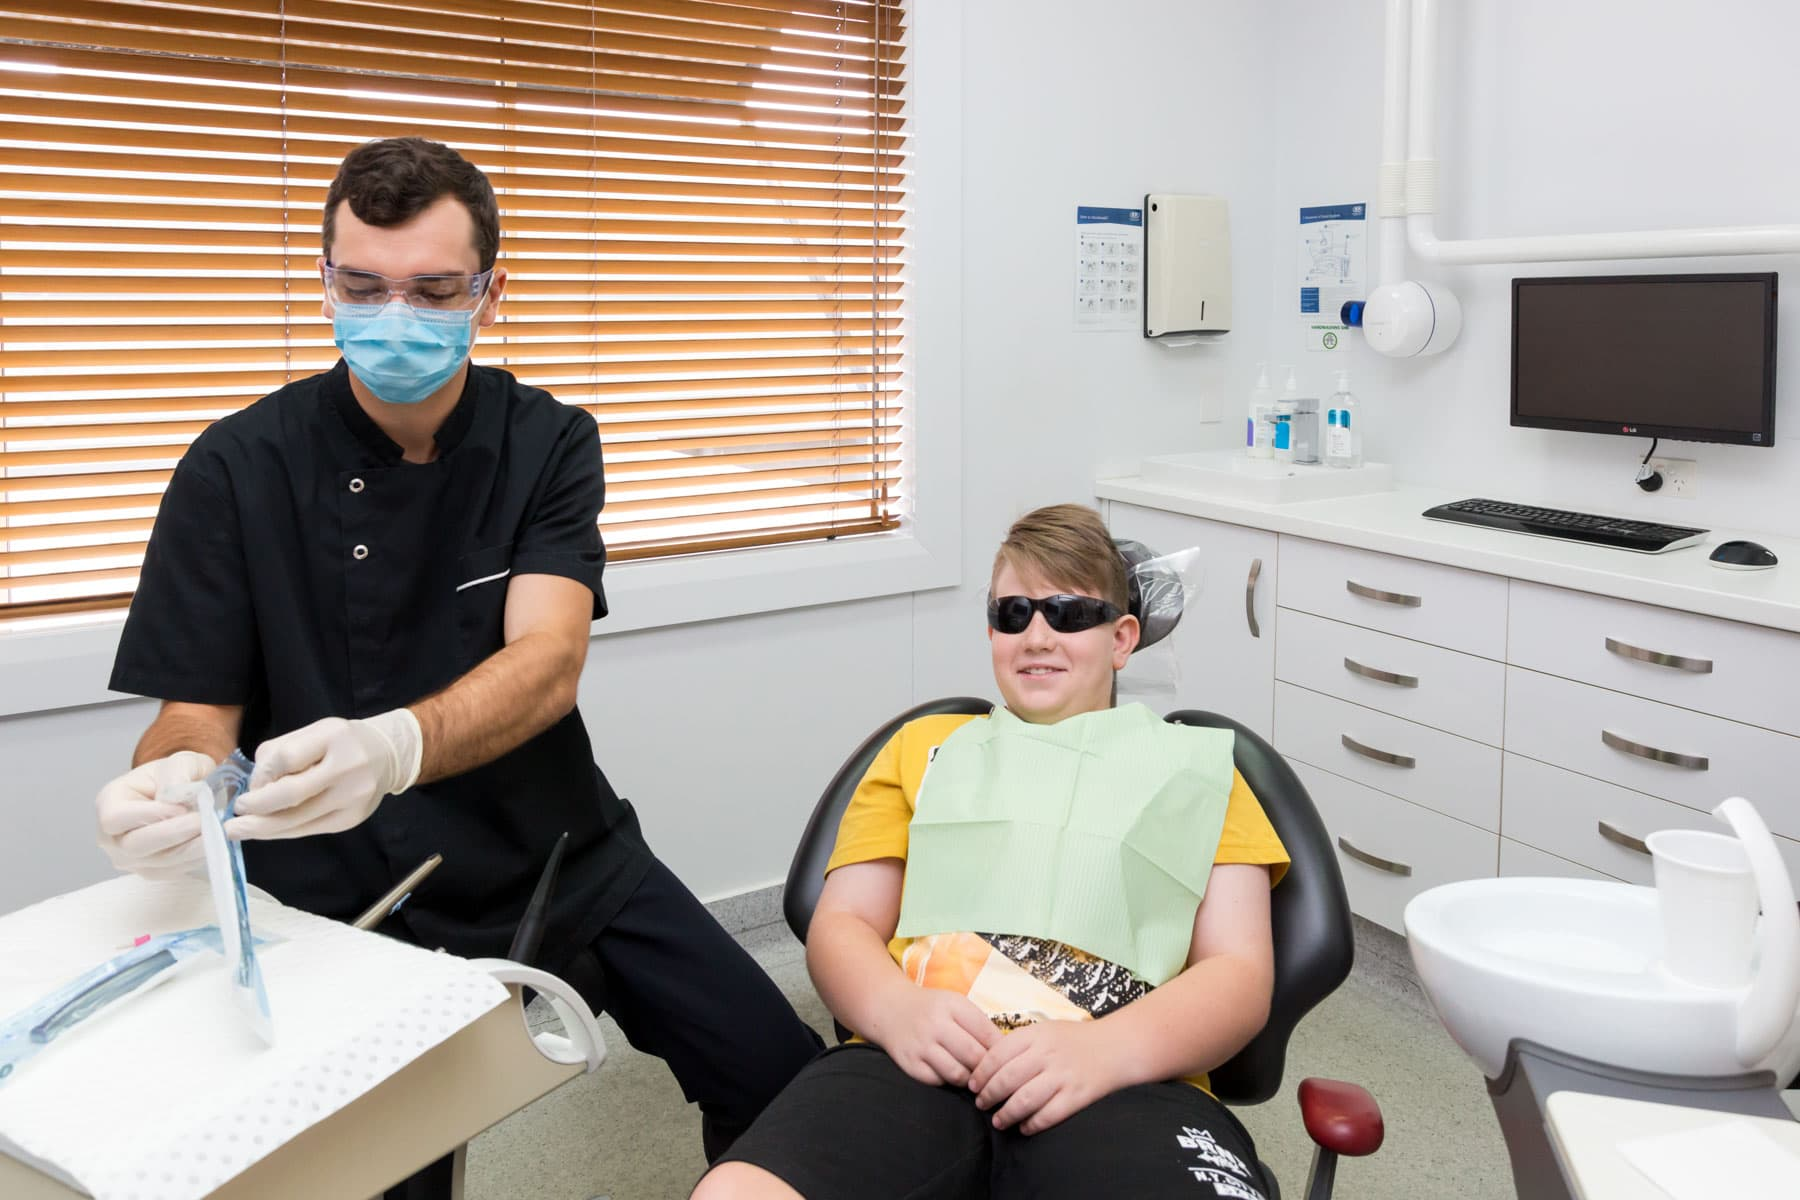 School Holiday dental checkups